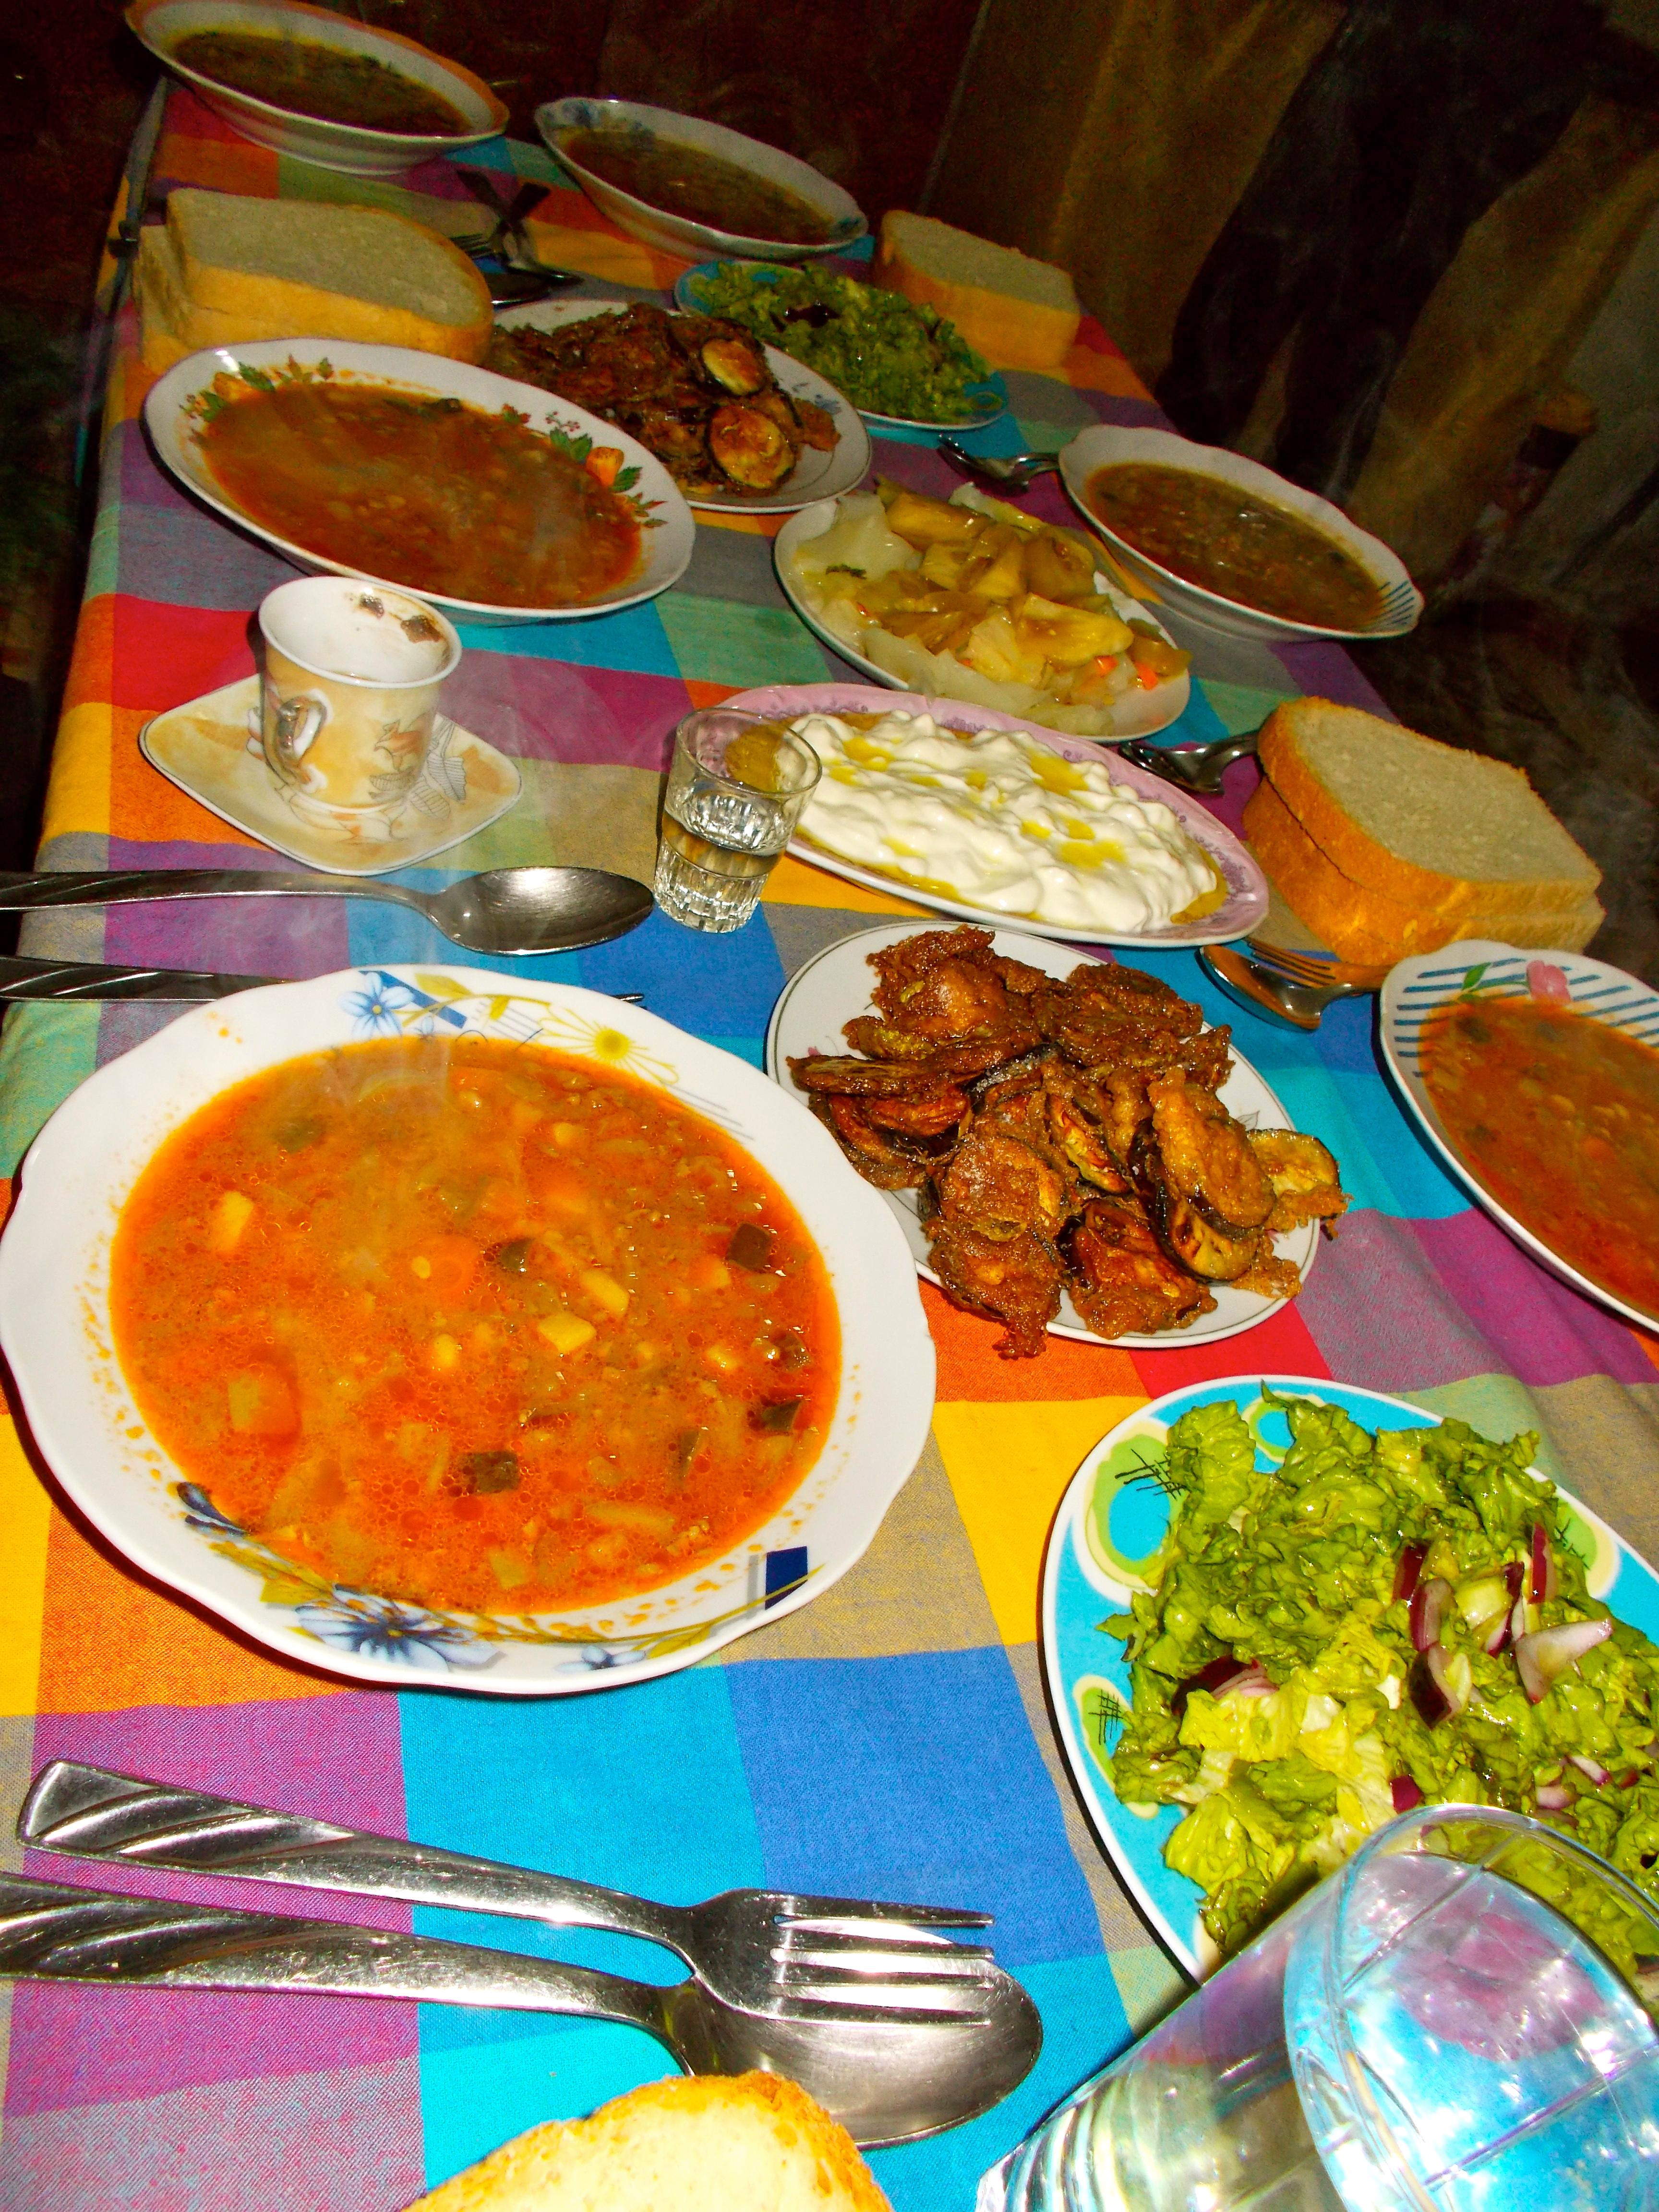 Pin albanian food on pinterest for Albanian cuisine